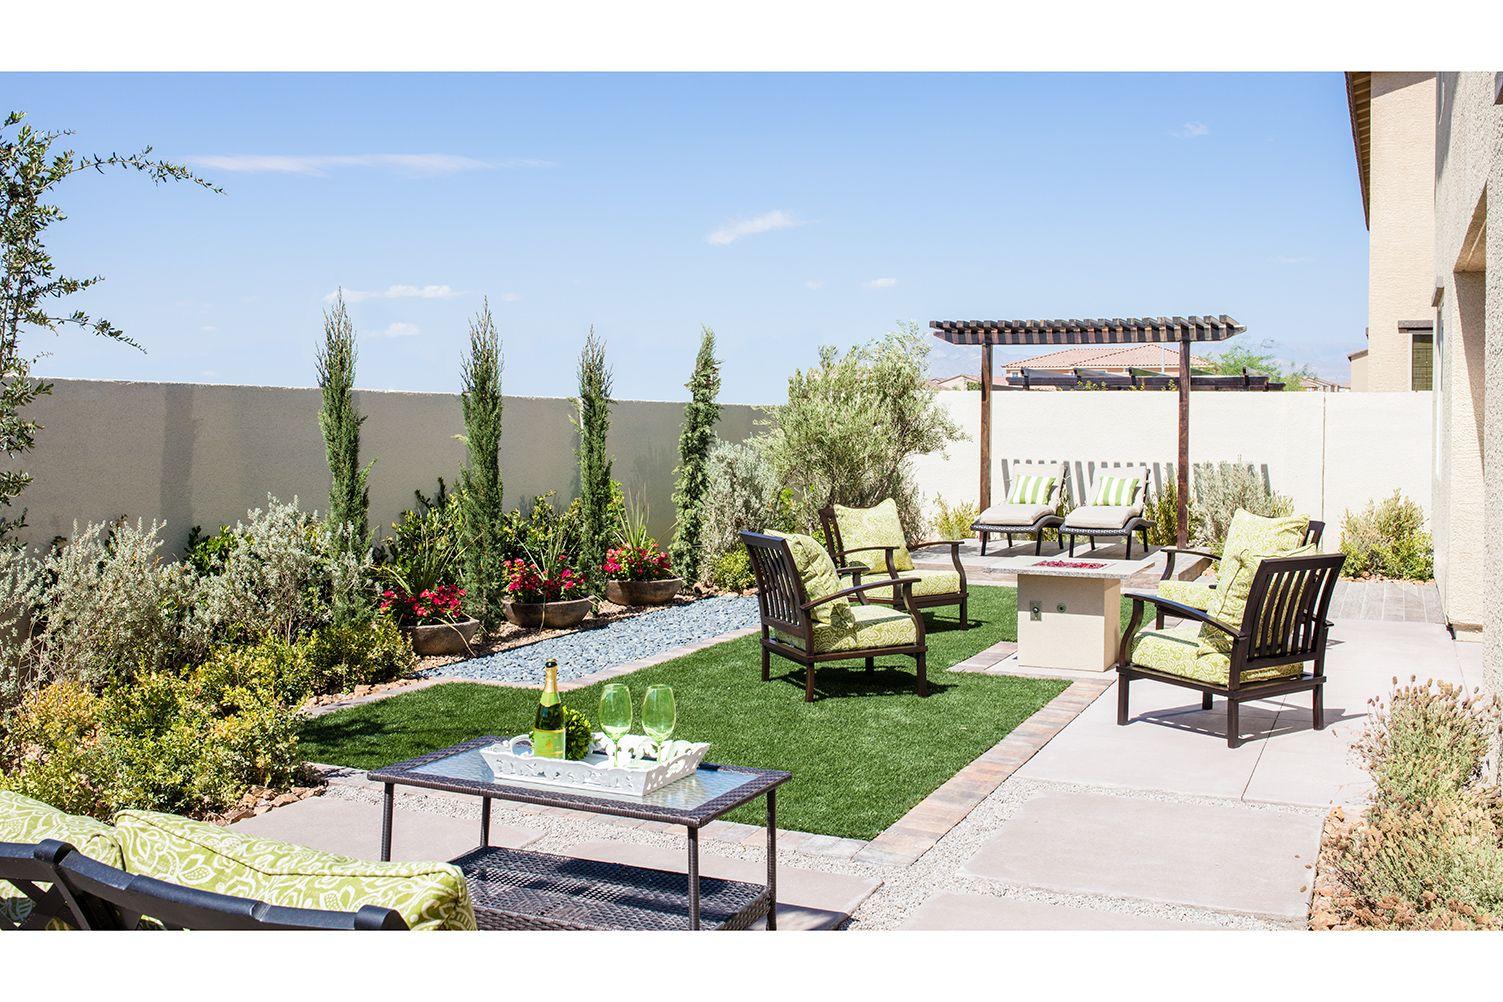 Castle Rock Image Gallery Homes For Sale North Las Vegas Desert Landscaping Backyard Backyard Design Backyard